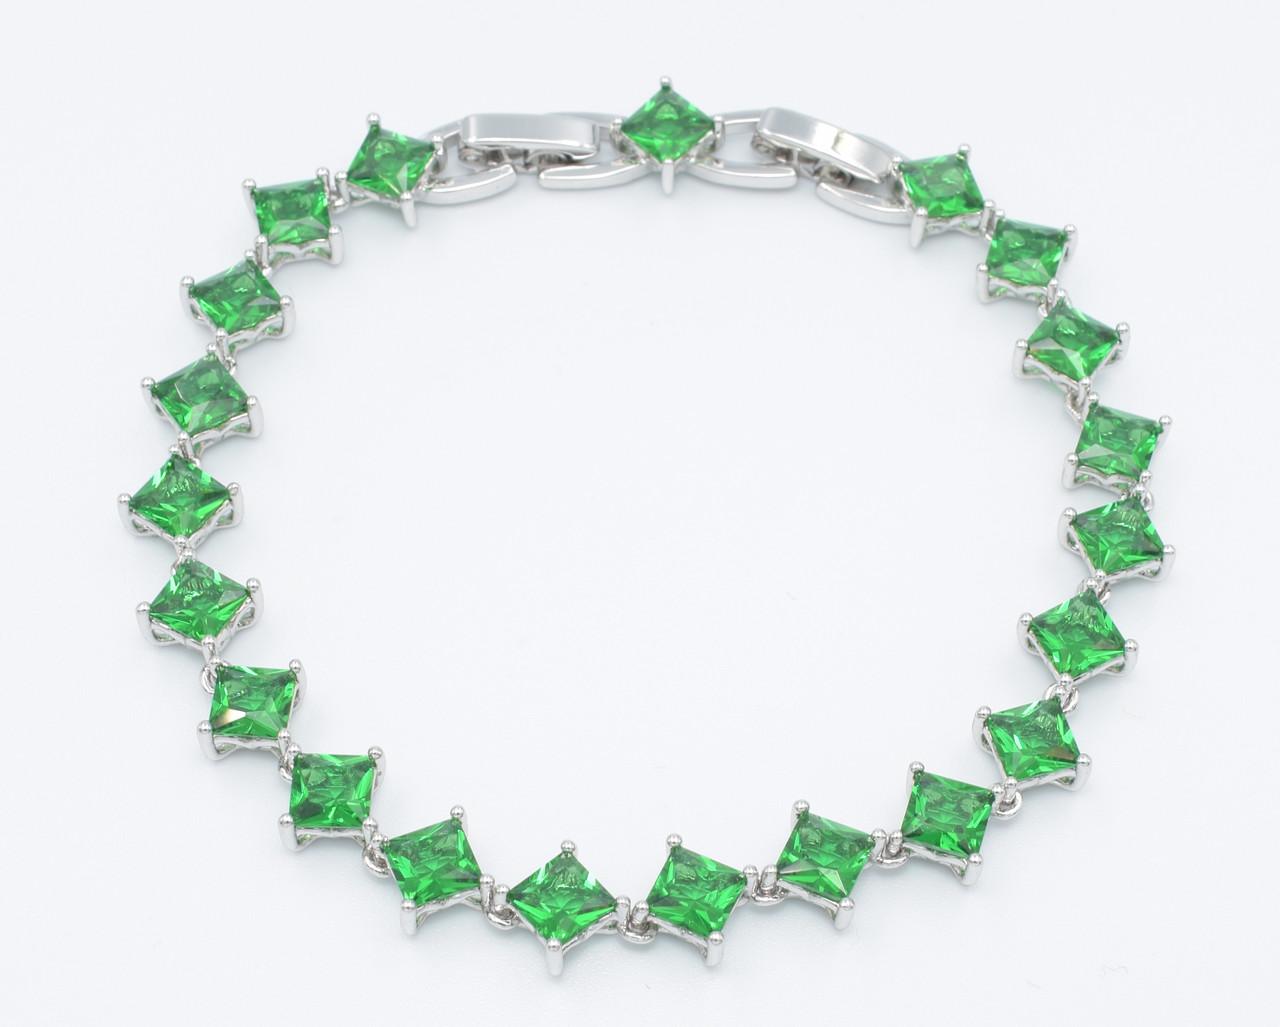 XUPING Браслет Родий с зелеными квадратными цирконами Ширина 7мм  Длина 18,5+1,5см (доп звено)